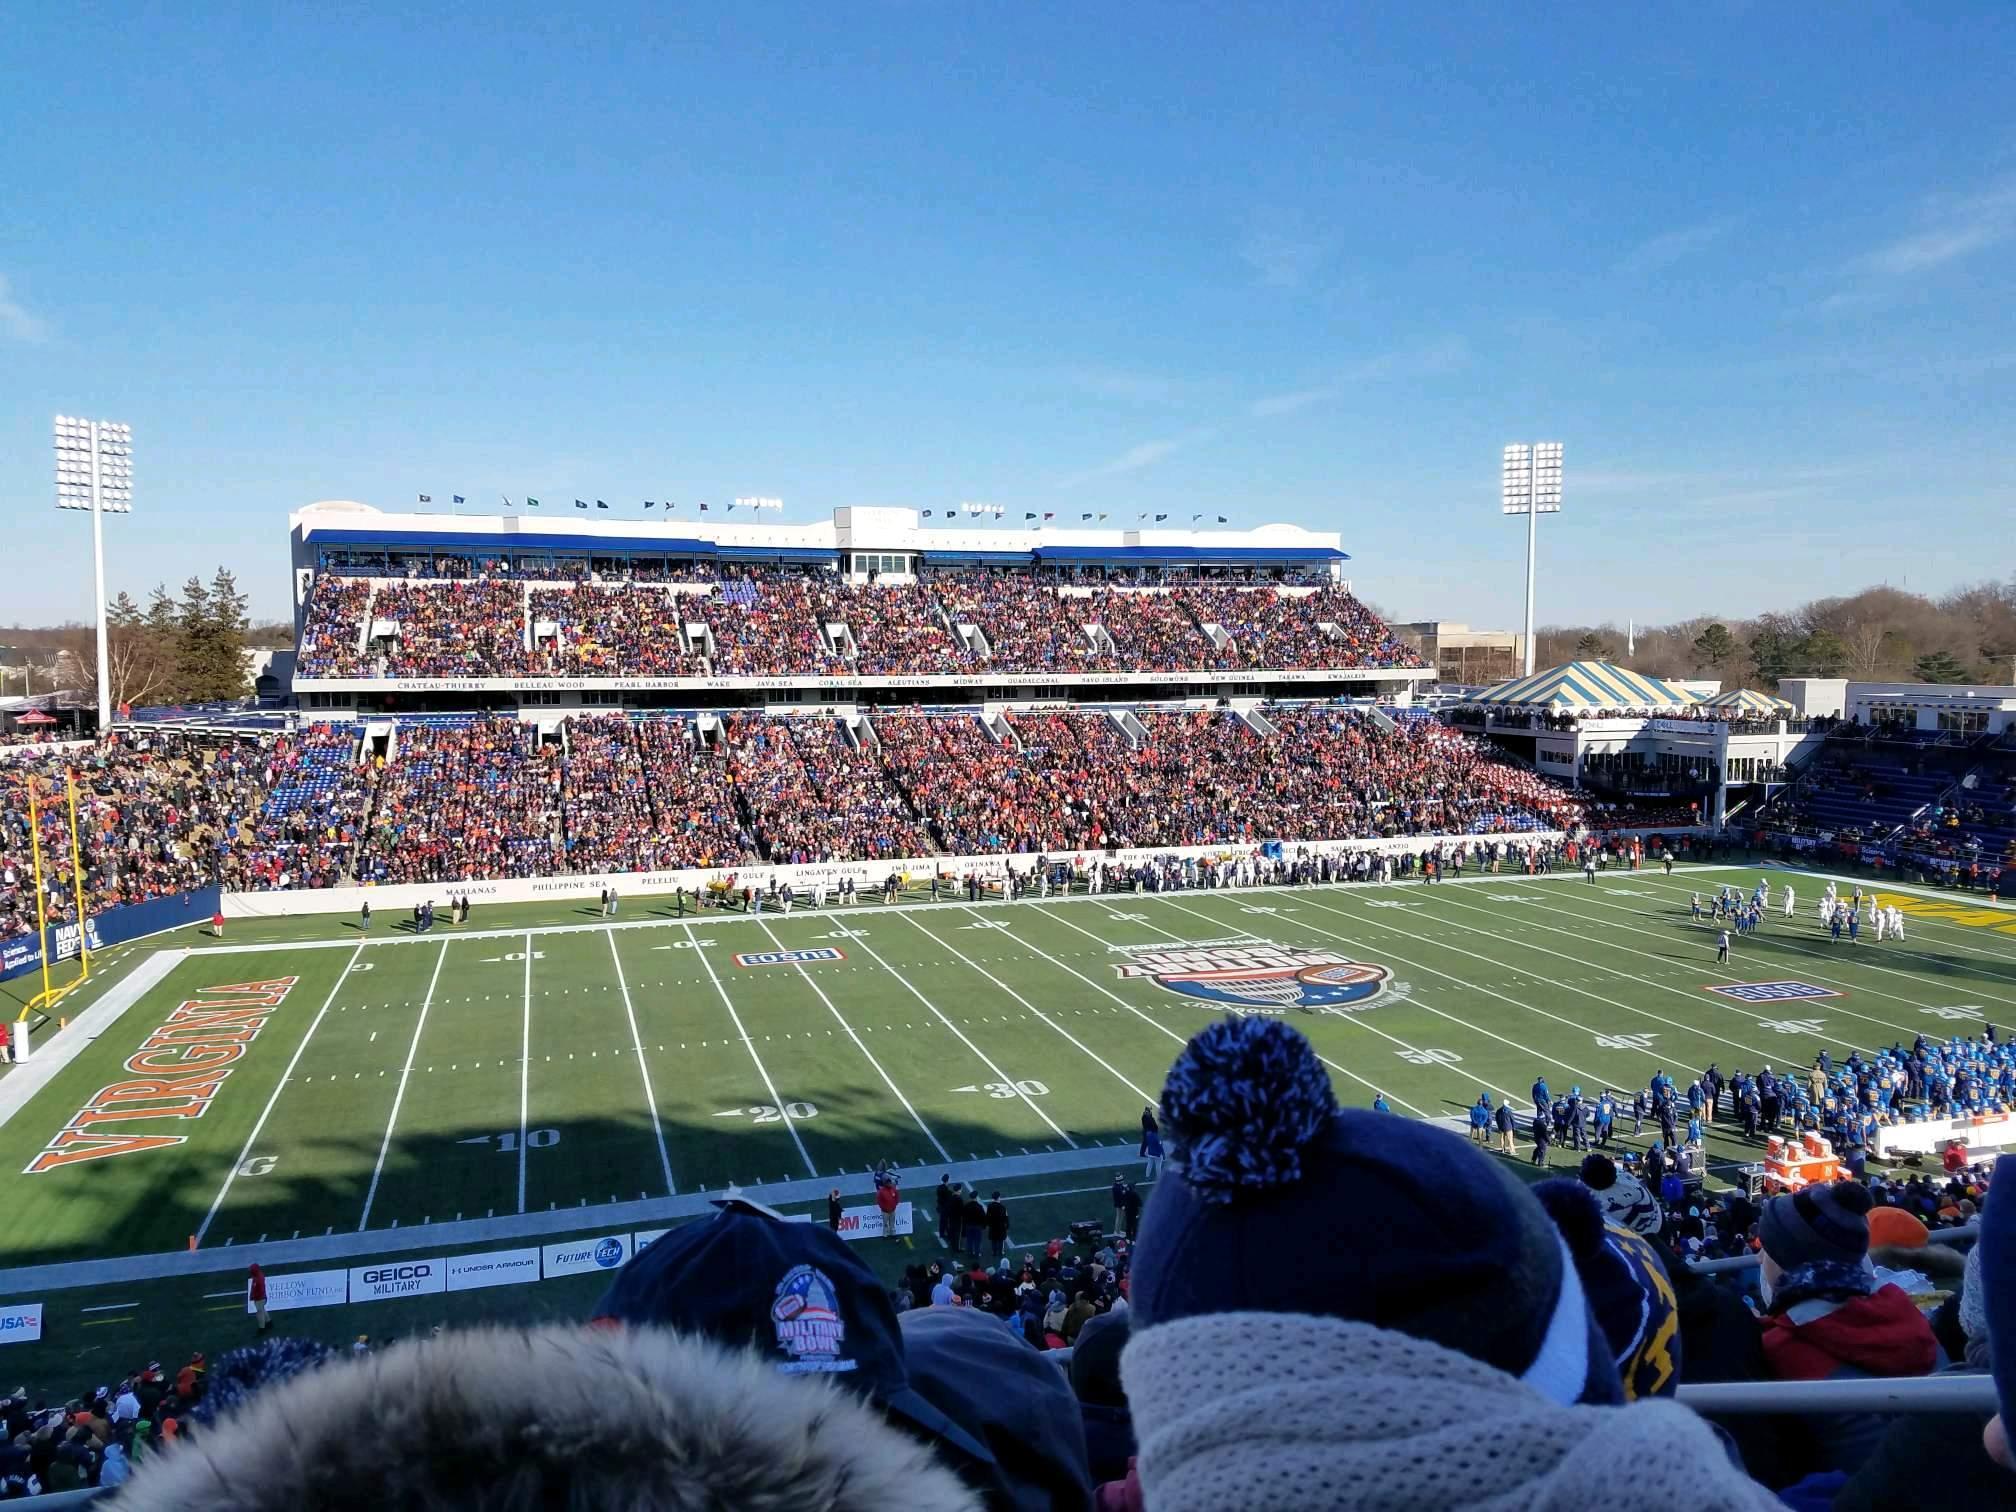 Navy-Marine Corps Memorial Stadium Section 107 Row 7 Seat 9